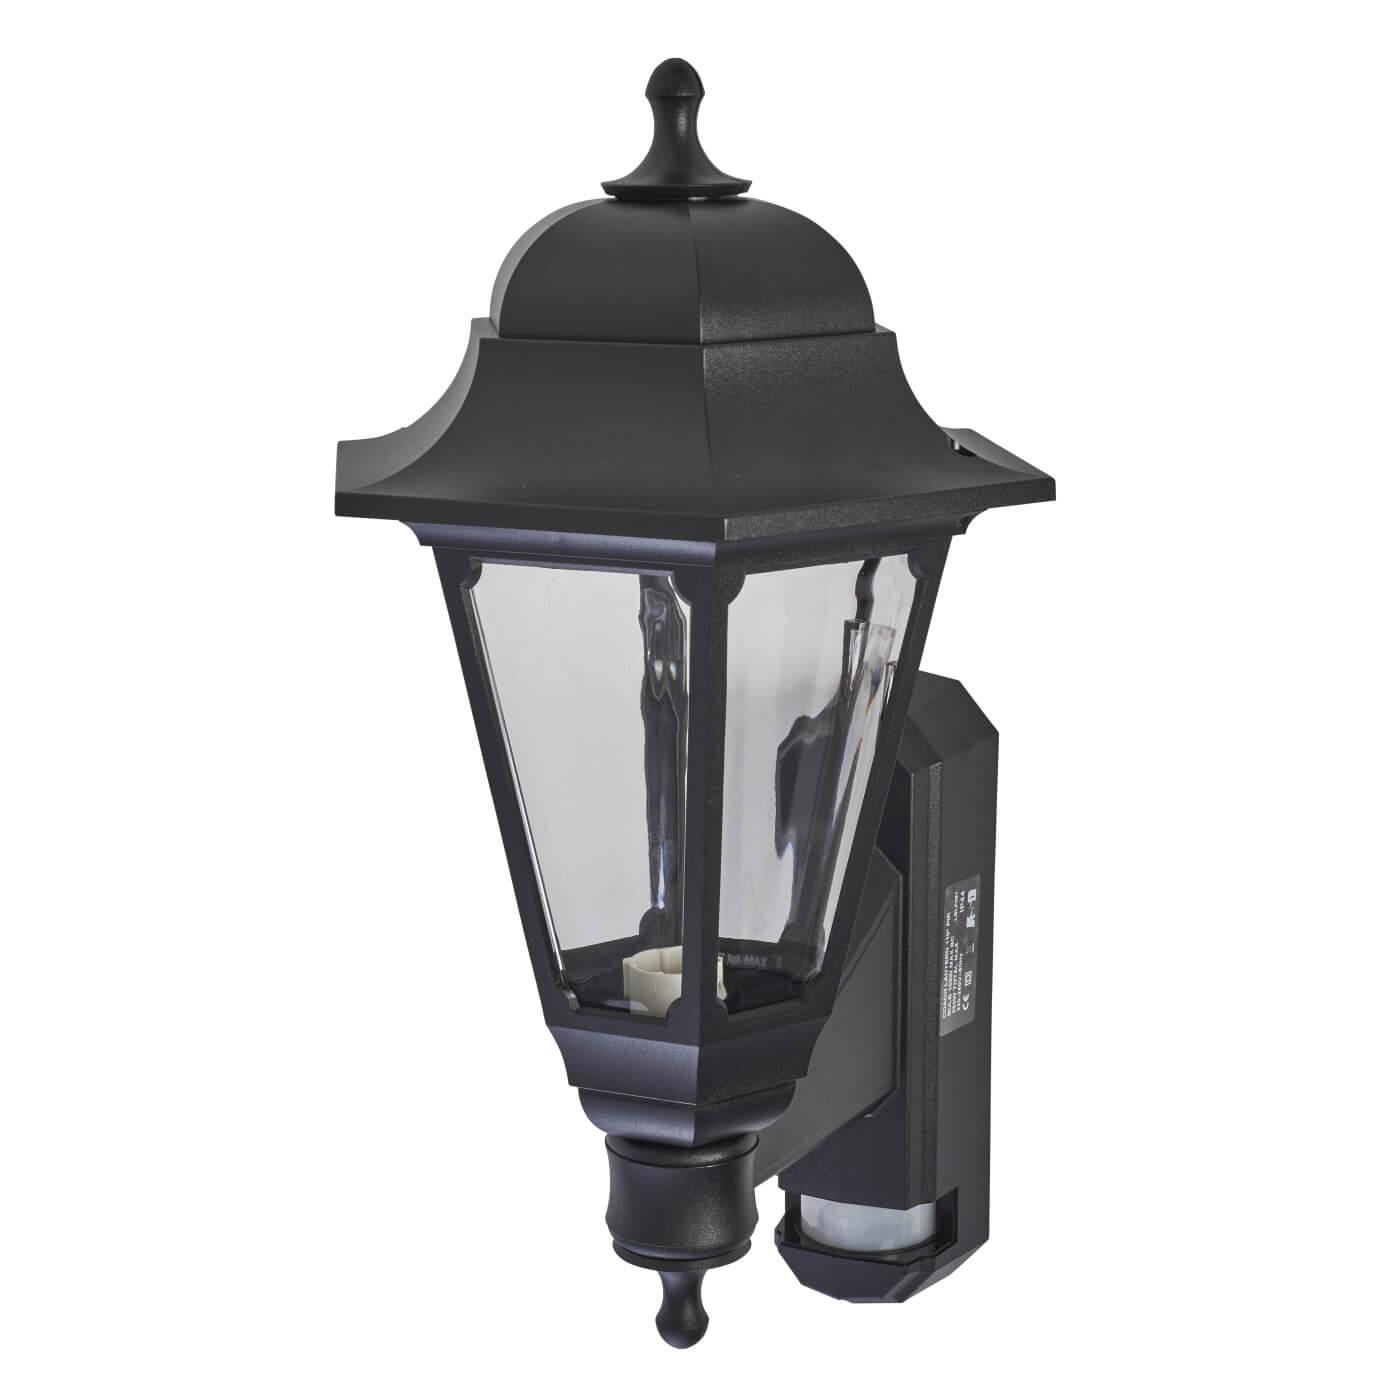 Asd Coach Pedestal Lantern: ASD Lighting Coach Lantern With PIR - Black